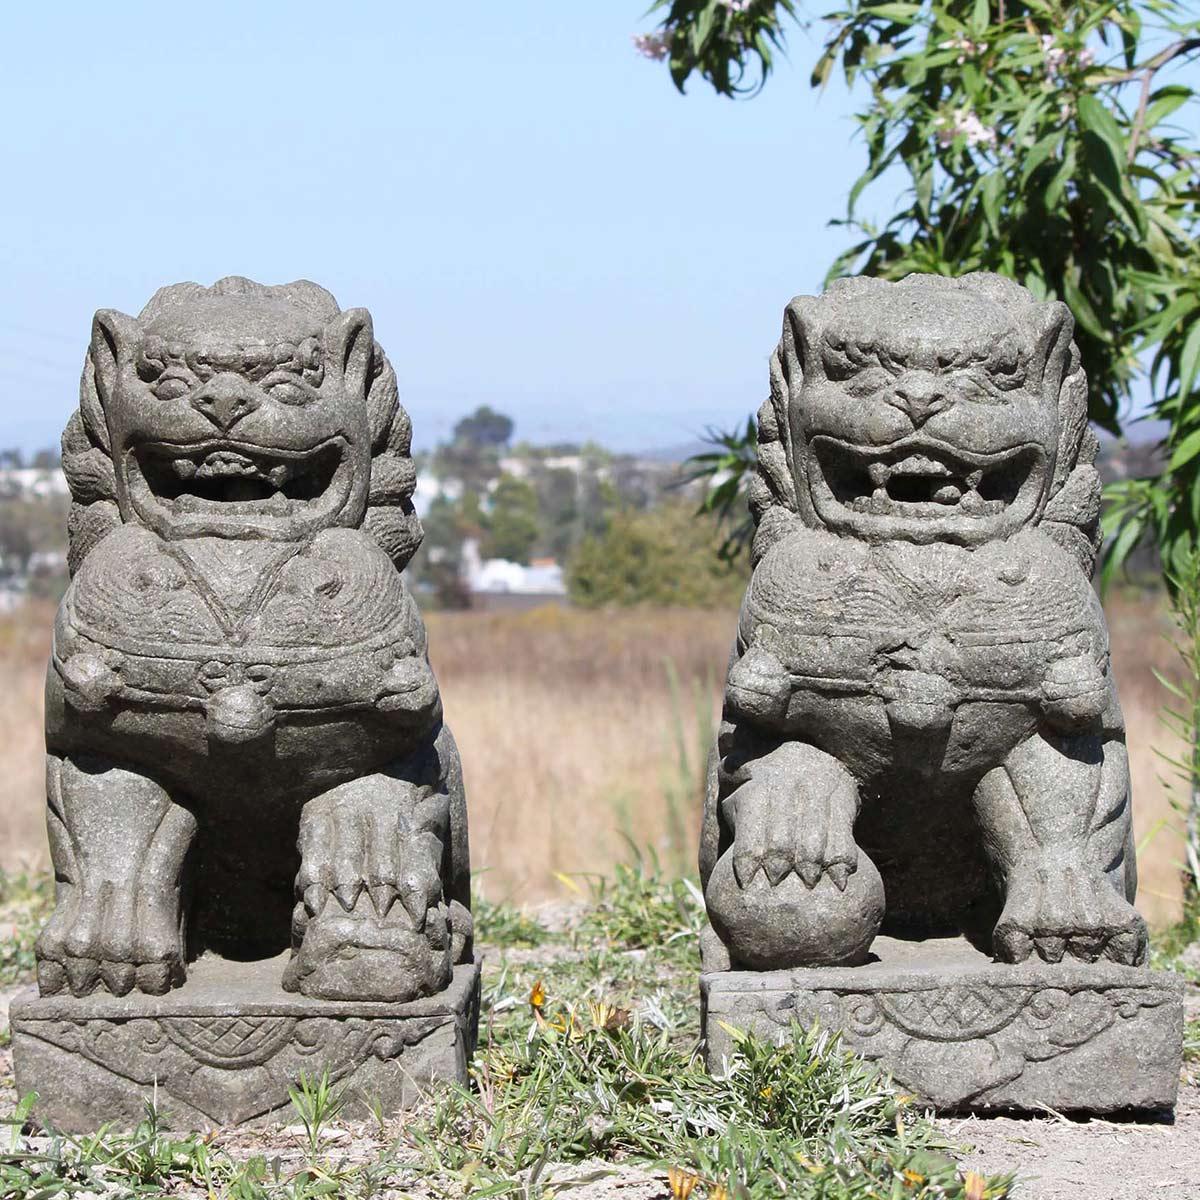 Pair of stone Foo dogs